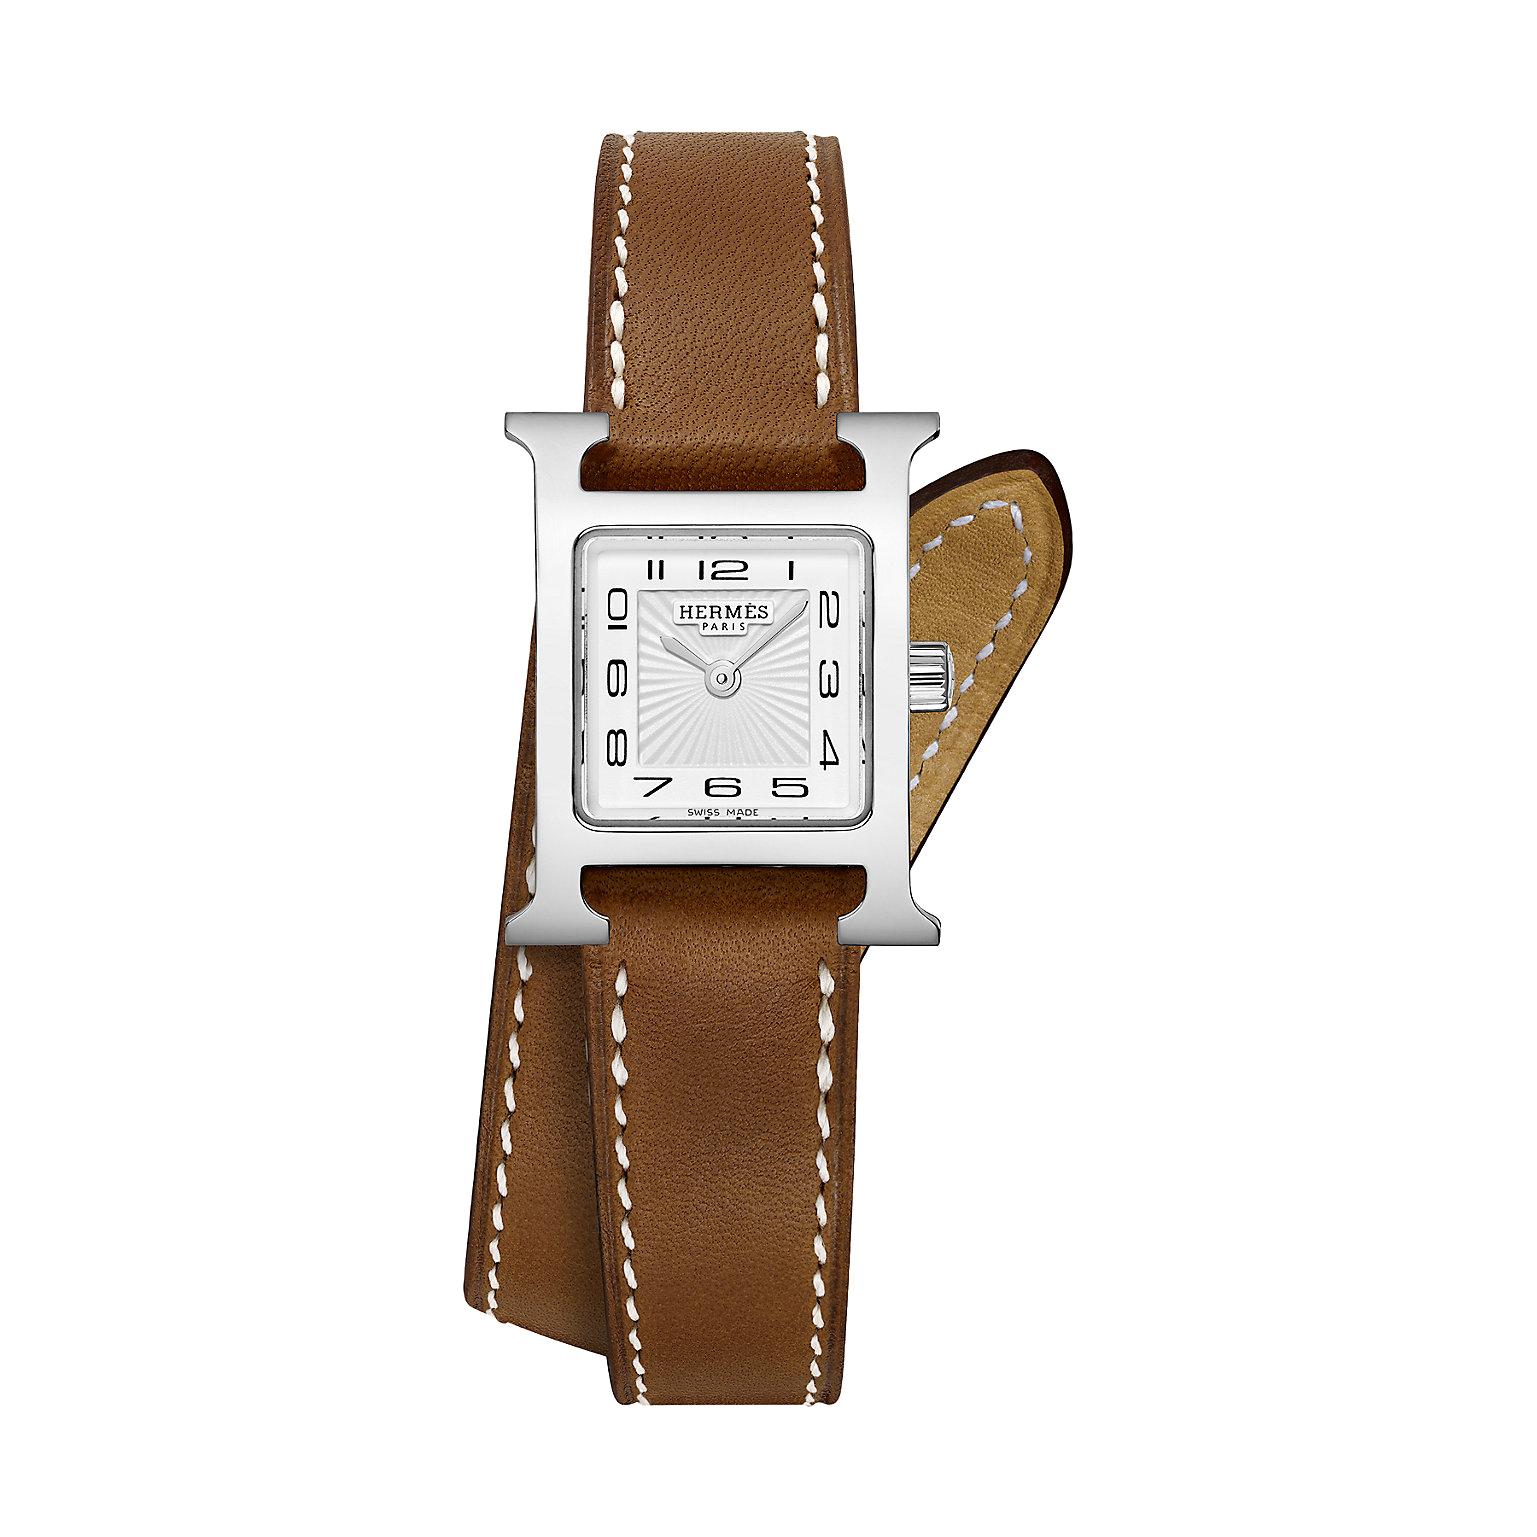 Hermès-heure-h-172-x-172mm-Hall-of-Time-037962WW00